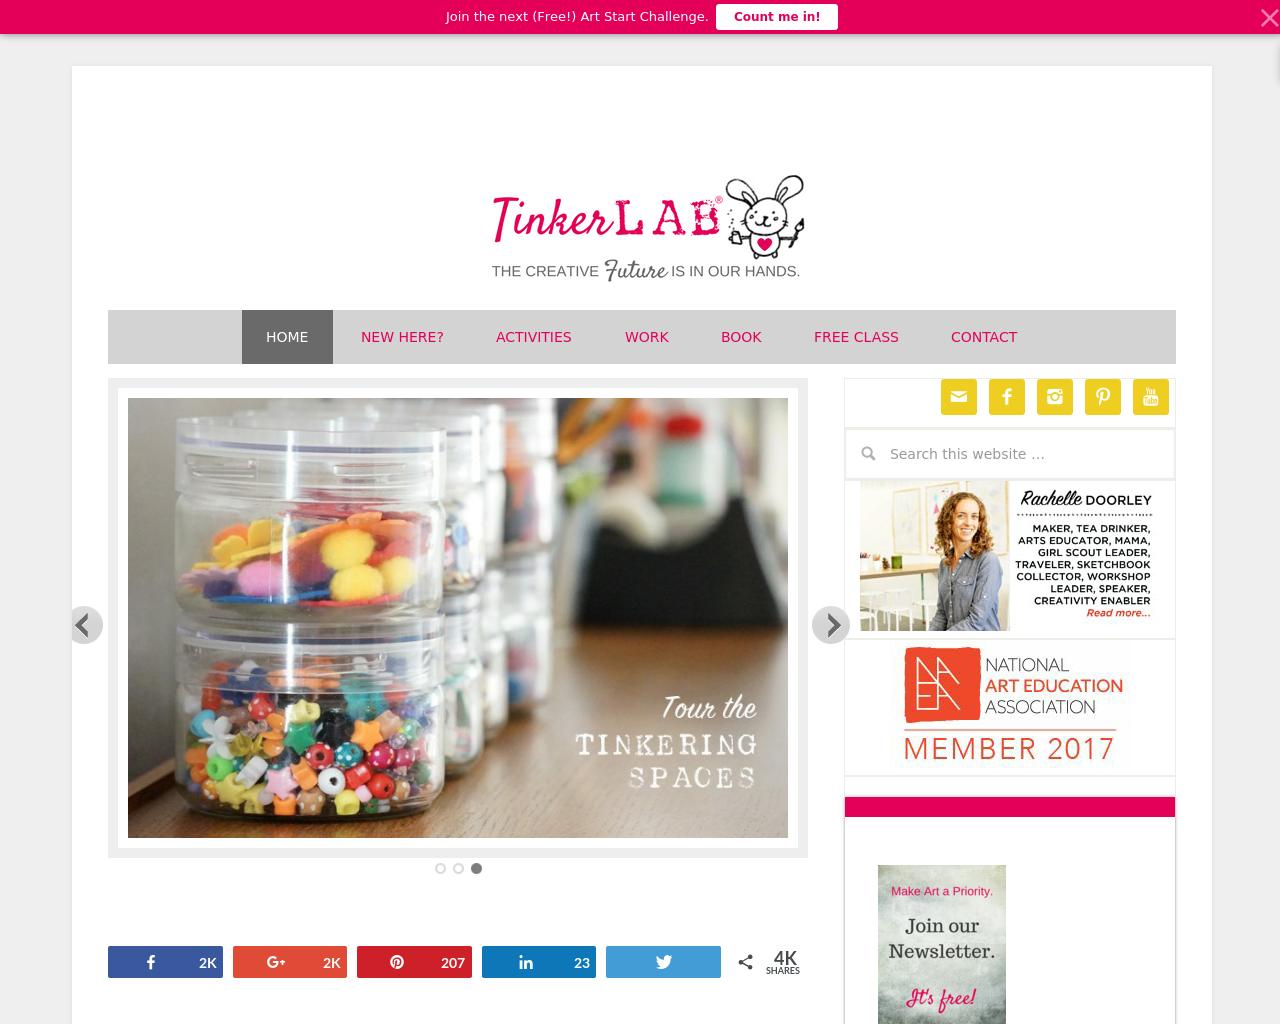 TinkerLab-Advertising-Reviews-Pricing